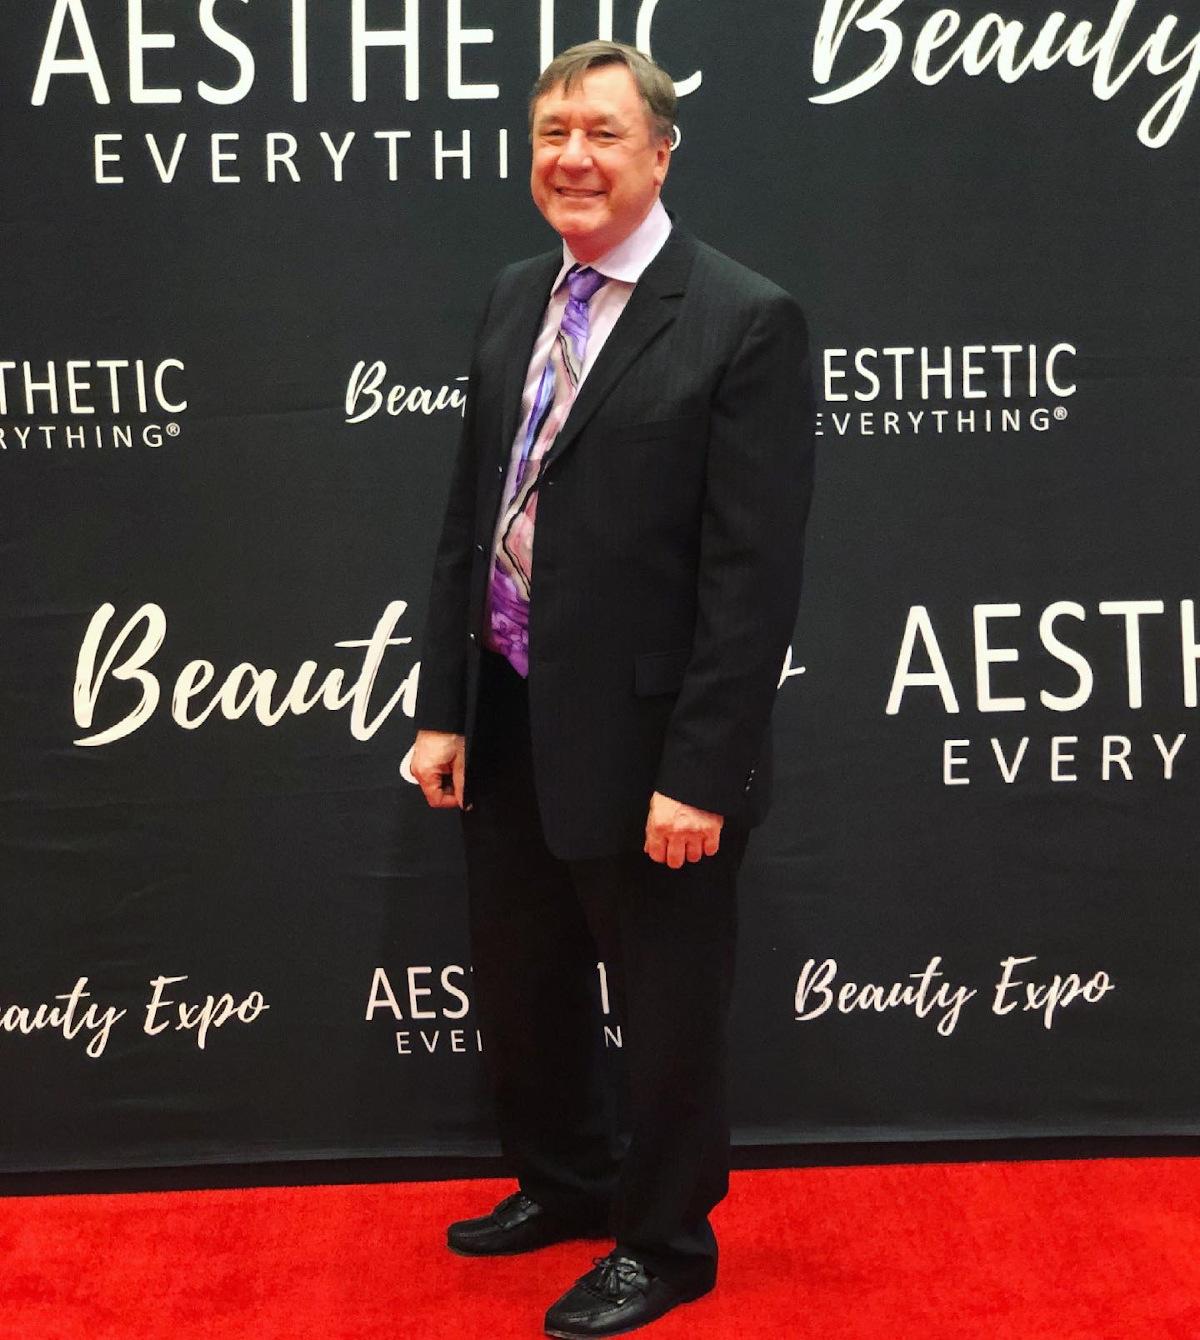 Aesthetic Everything Best Plastic Surgeon West 2021